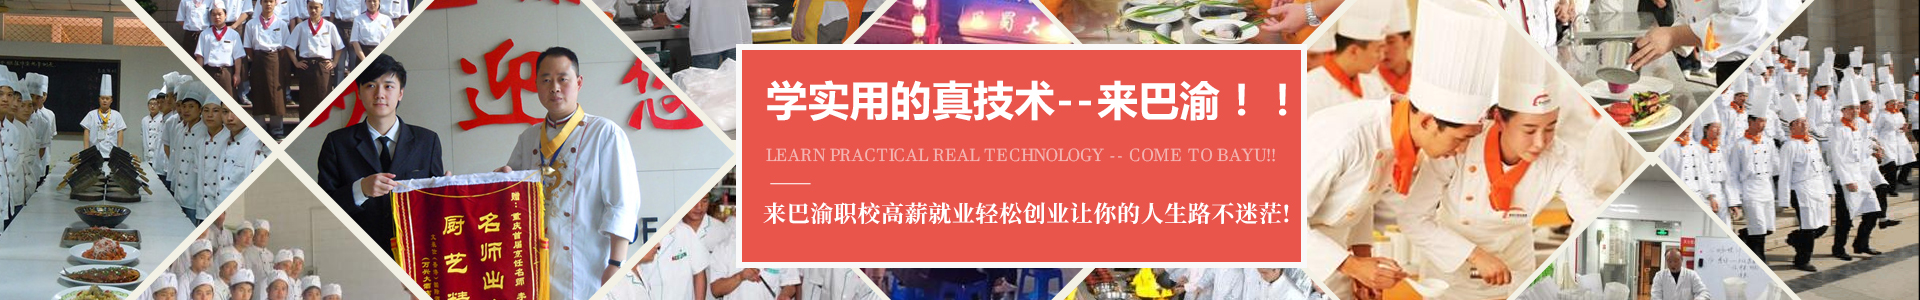 http://www.cqbayu.cn/data/images/slide/20191017105019_319.jpg